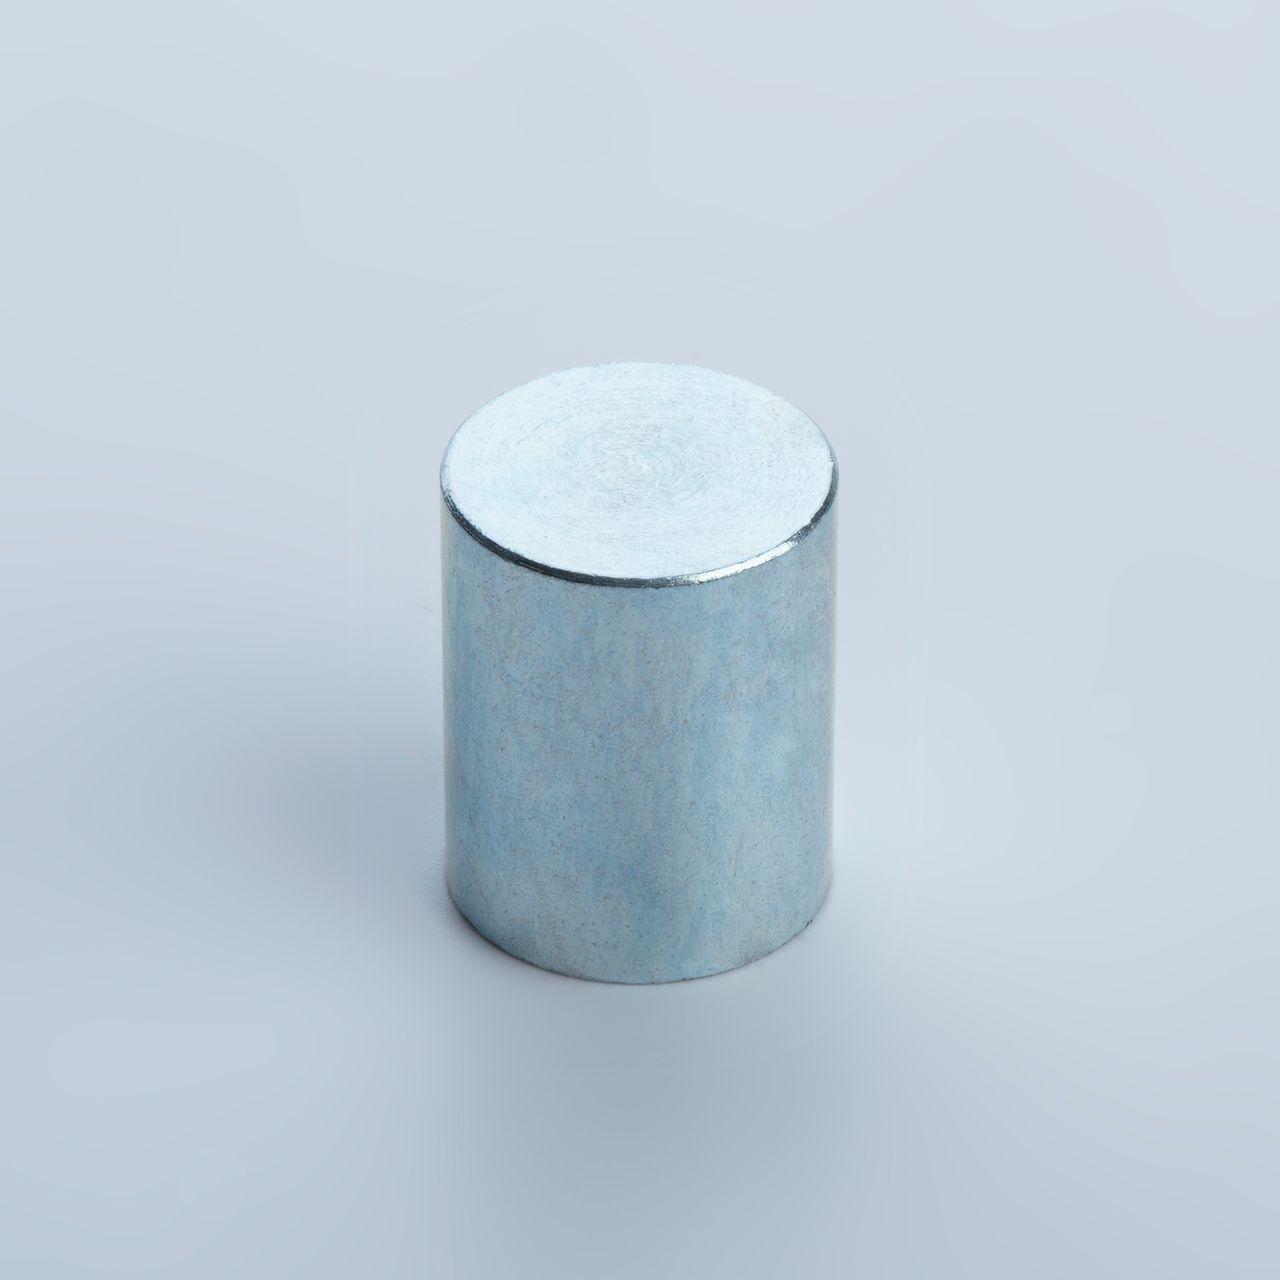 Stabgreifer aus Neodym, Stahlgehäuse, verzinkt, thyssenkrupp Magnettechnik